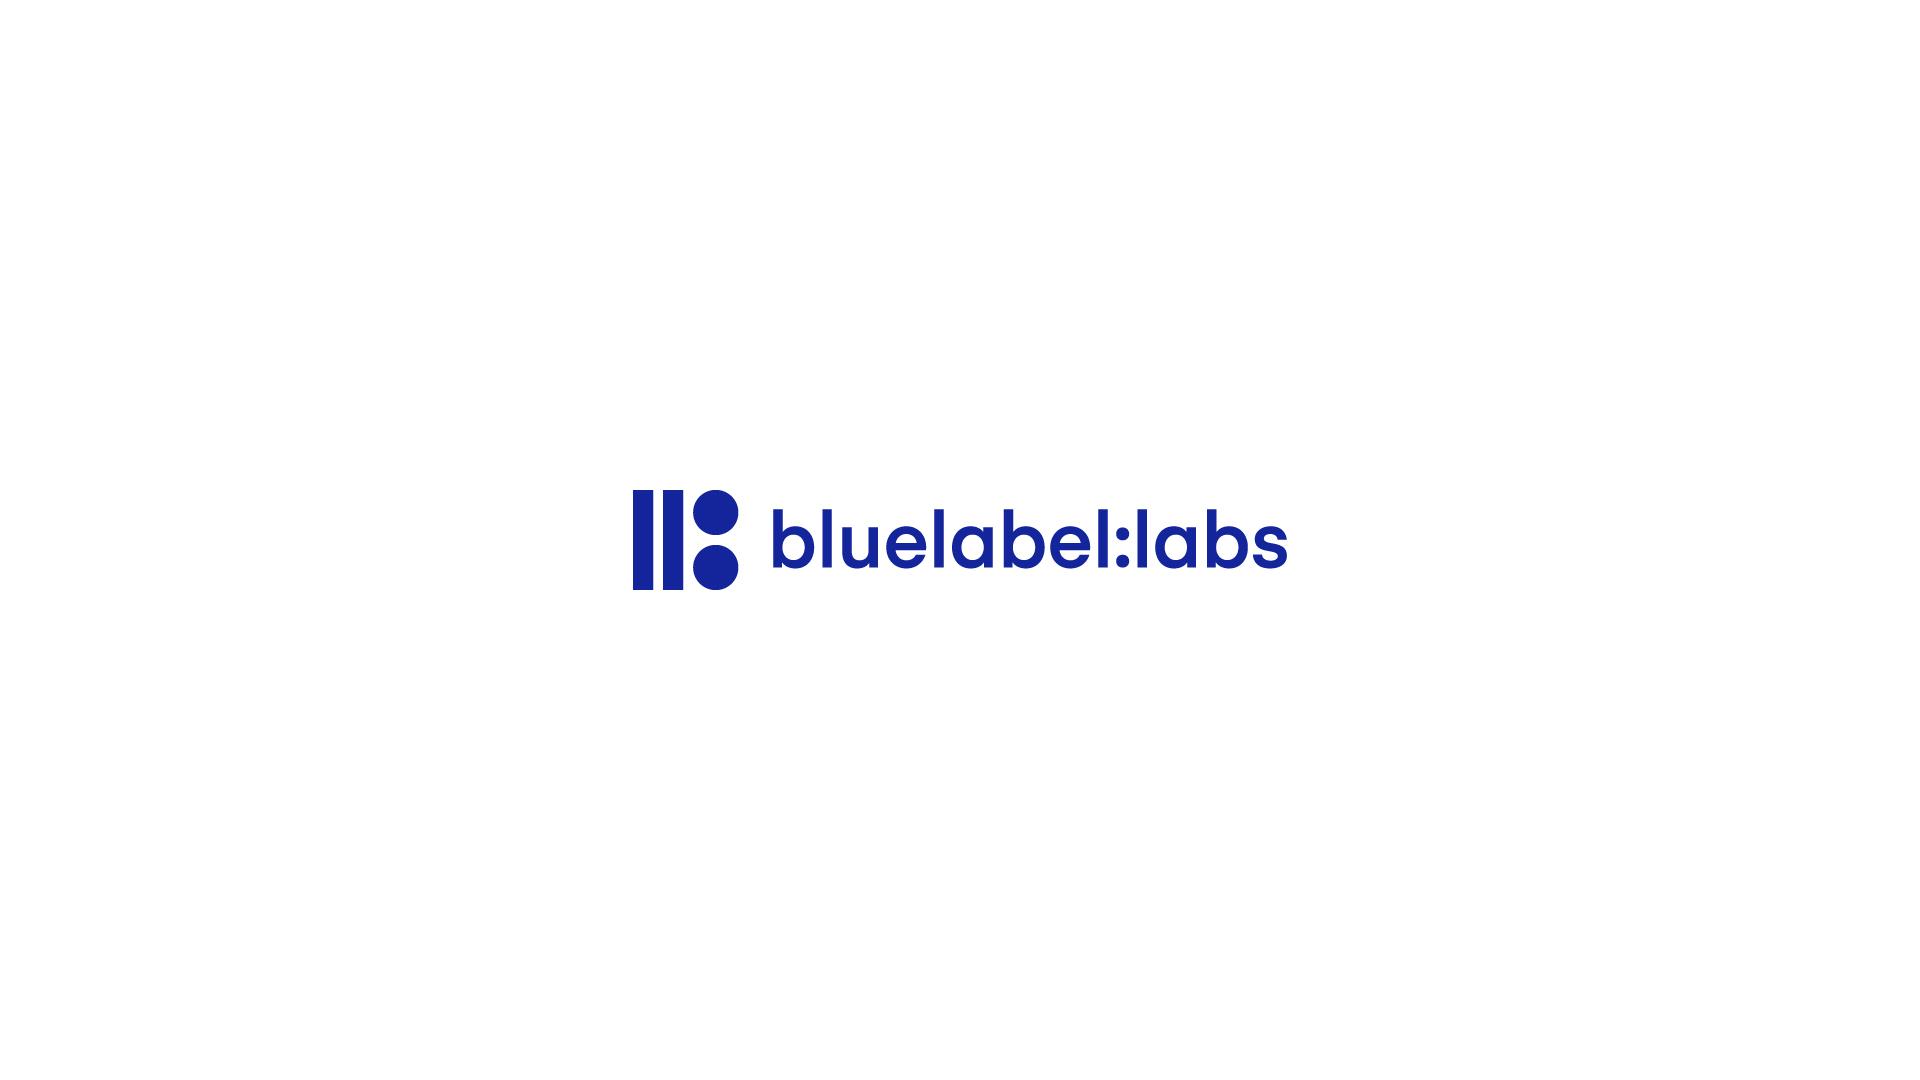 Bluelabel design presentation6